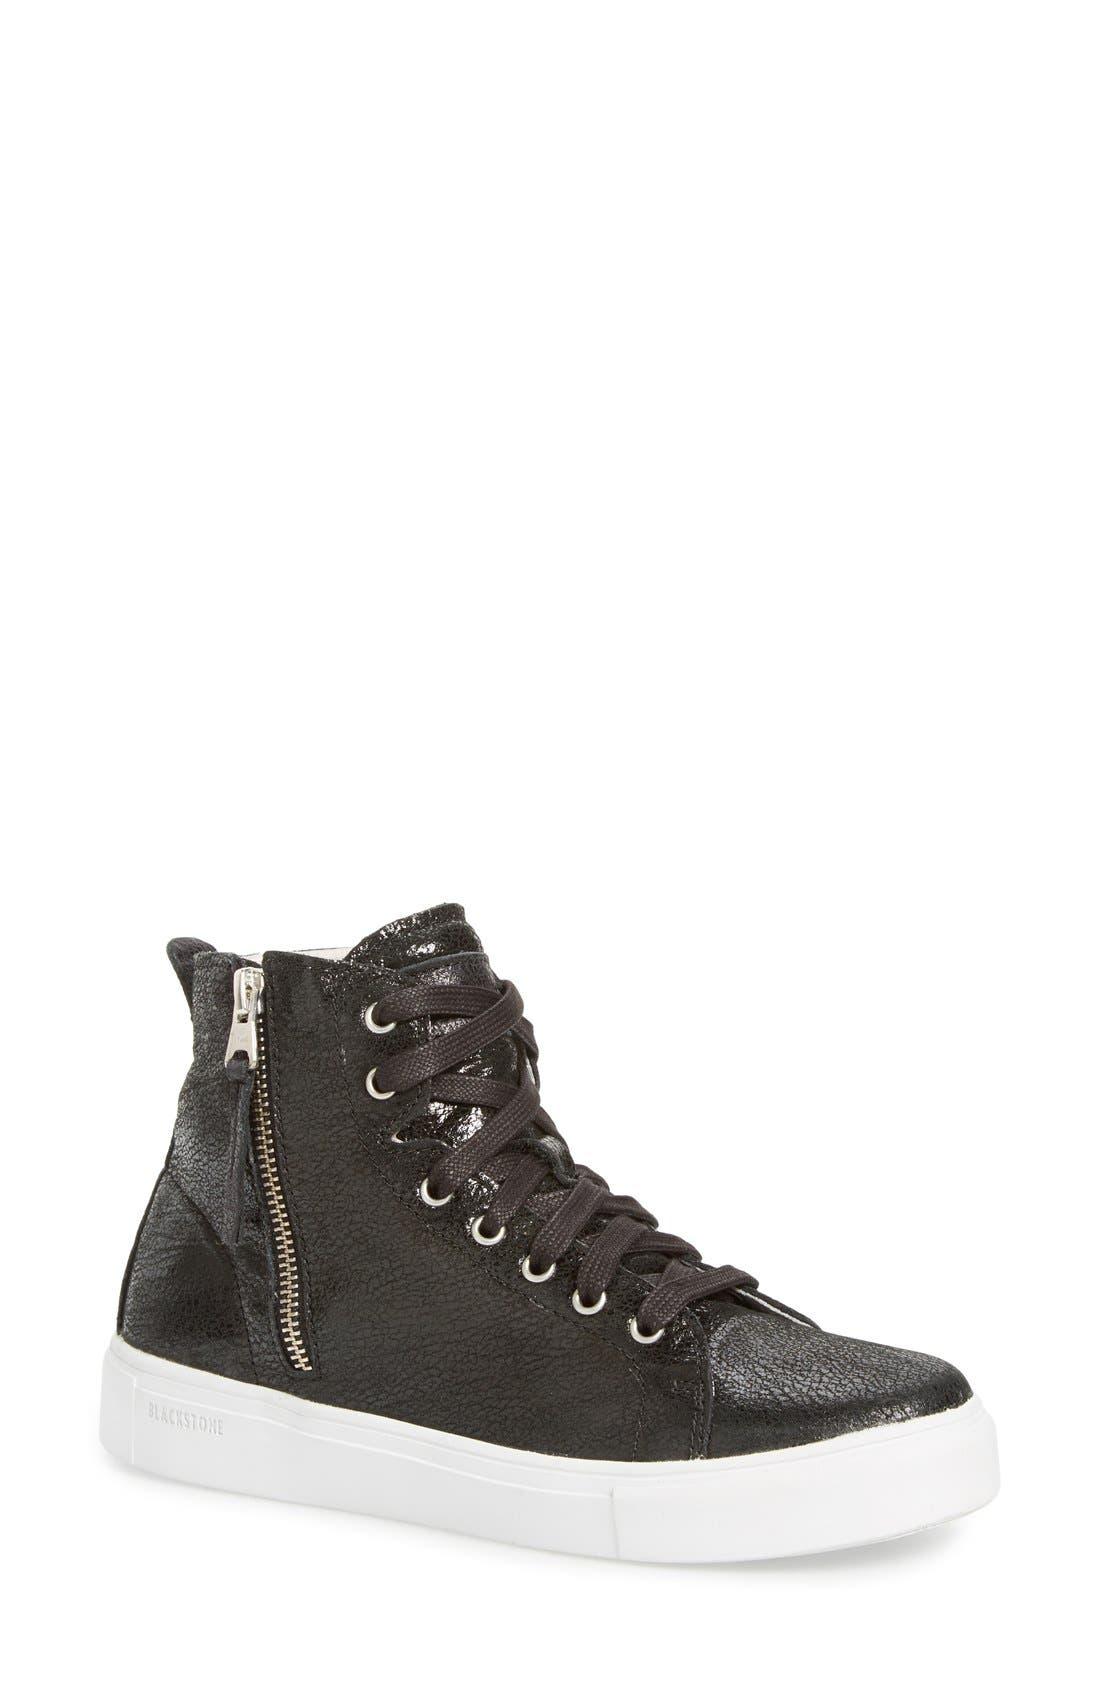 'LL65' High Top Sneaker,                             Main thumbnail 1, color,                             004